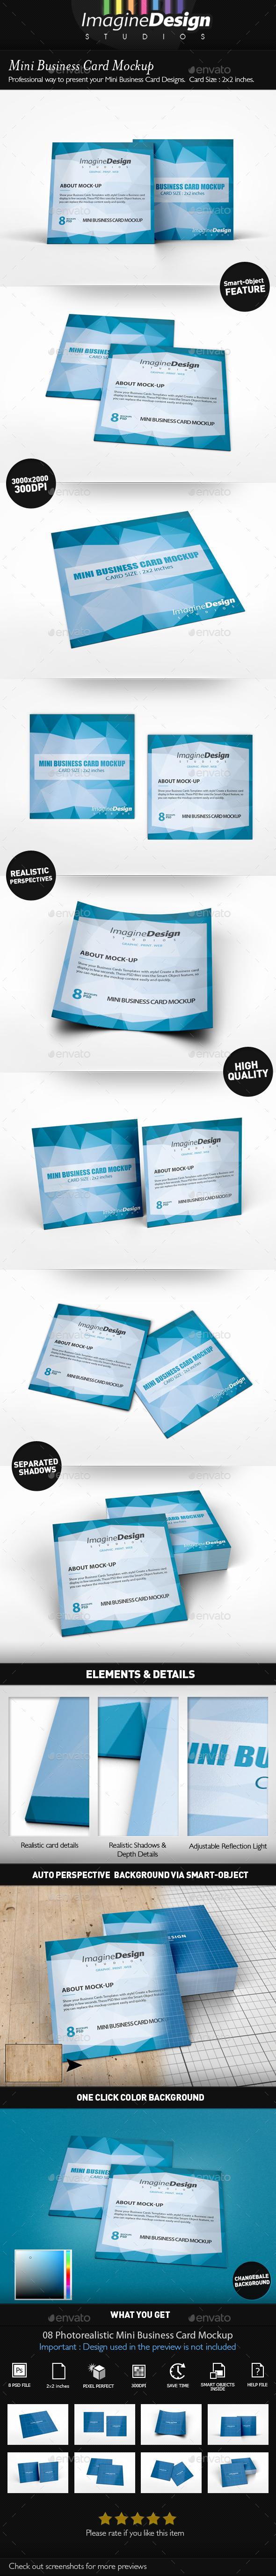 Mini Business Card Mockup - Business Cards Print